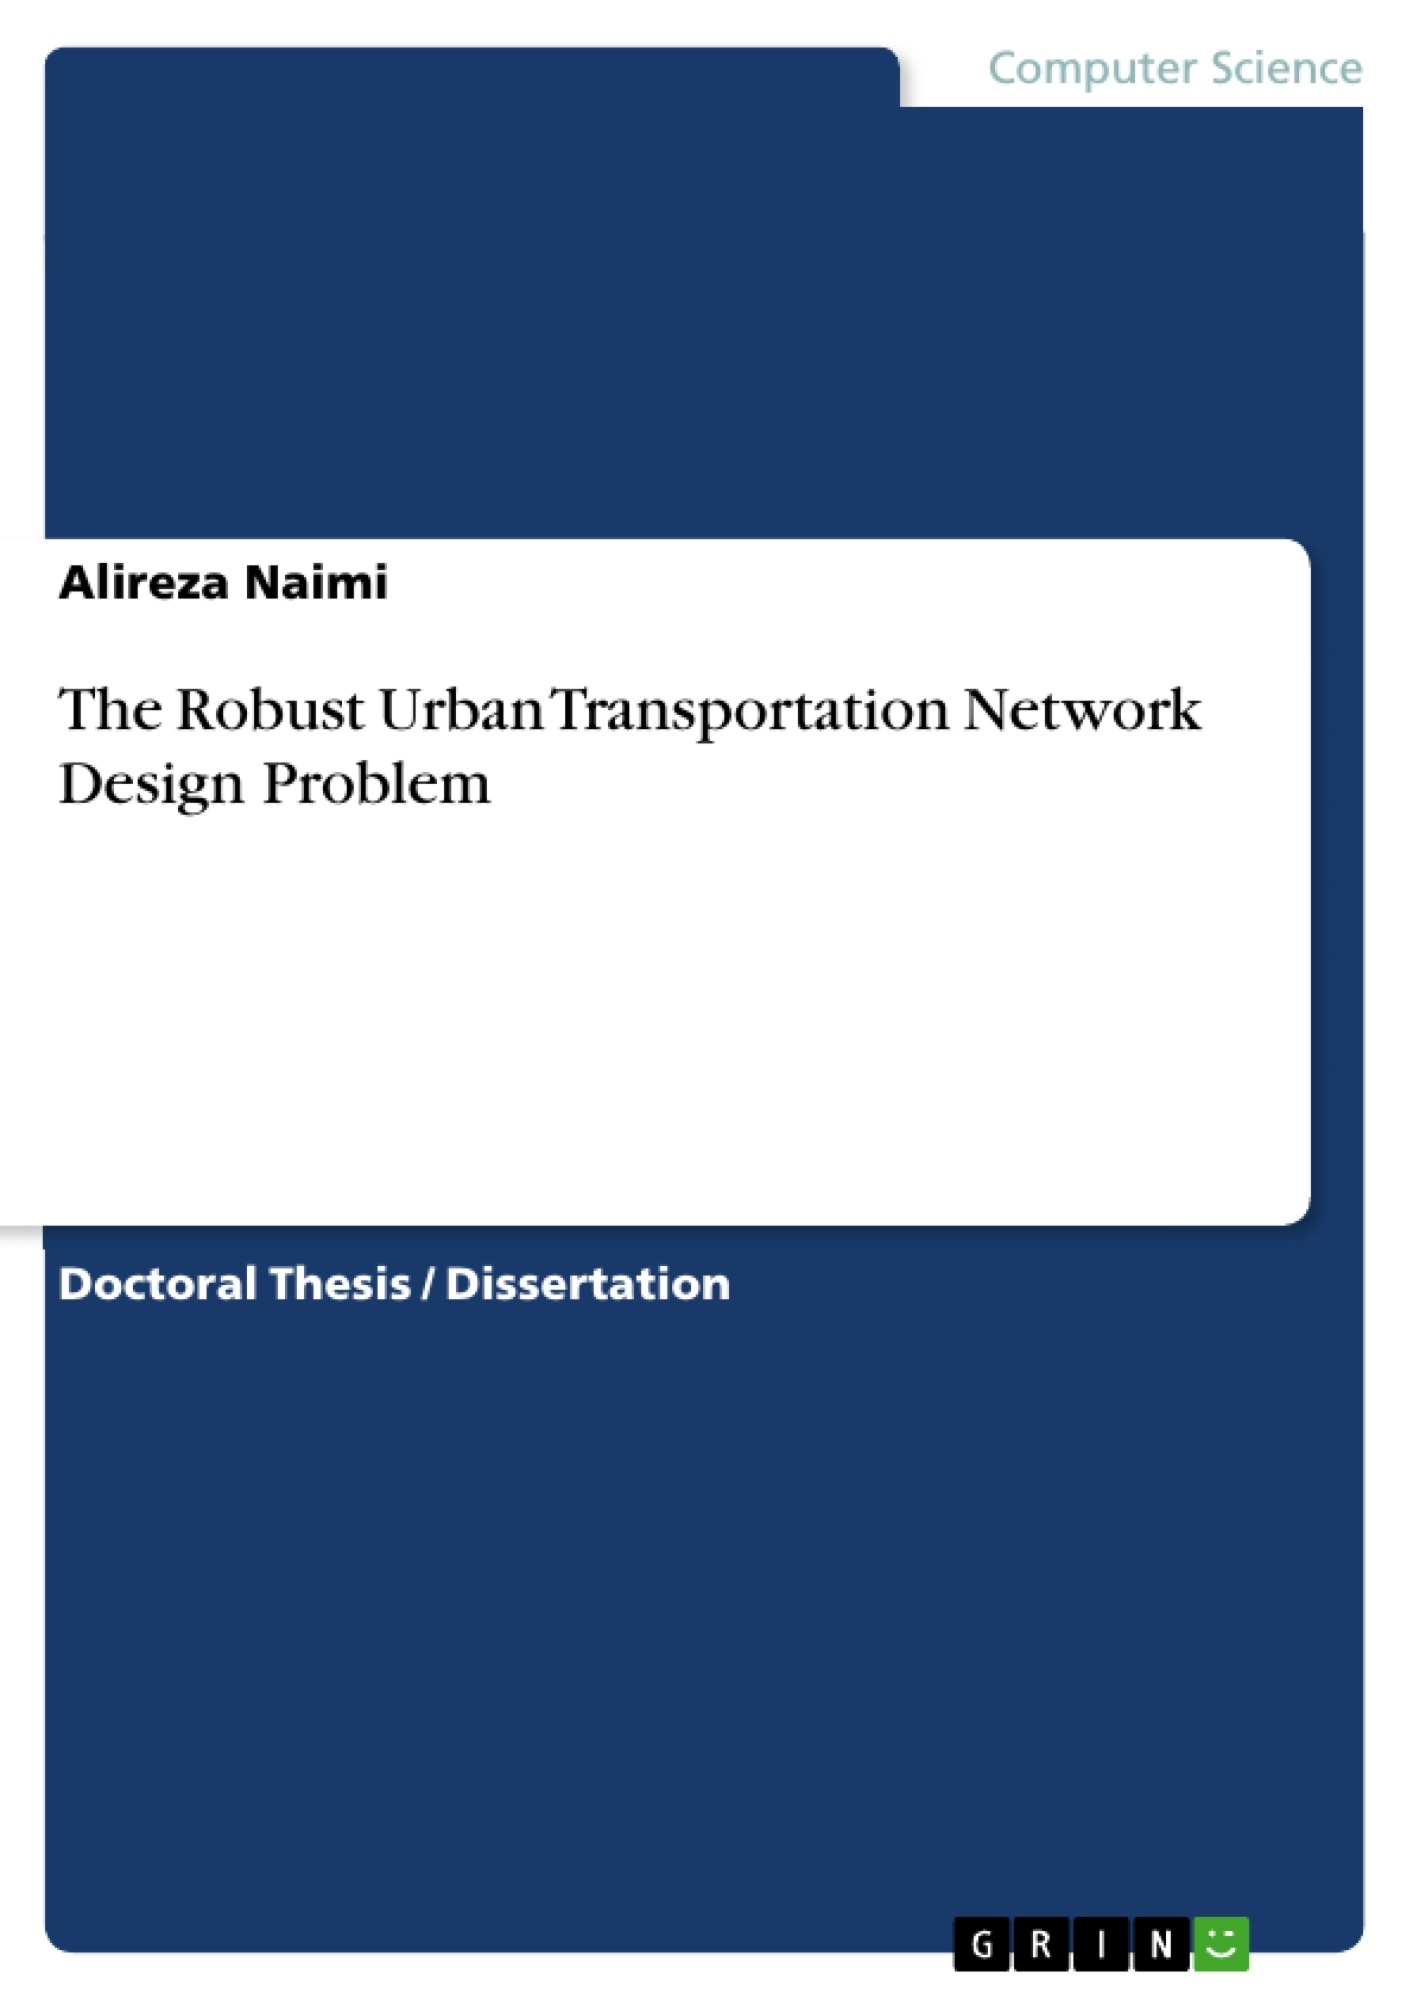 Title: The Robust Urban Transportation Network Design Problem